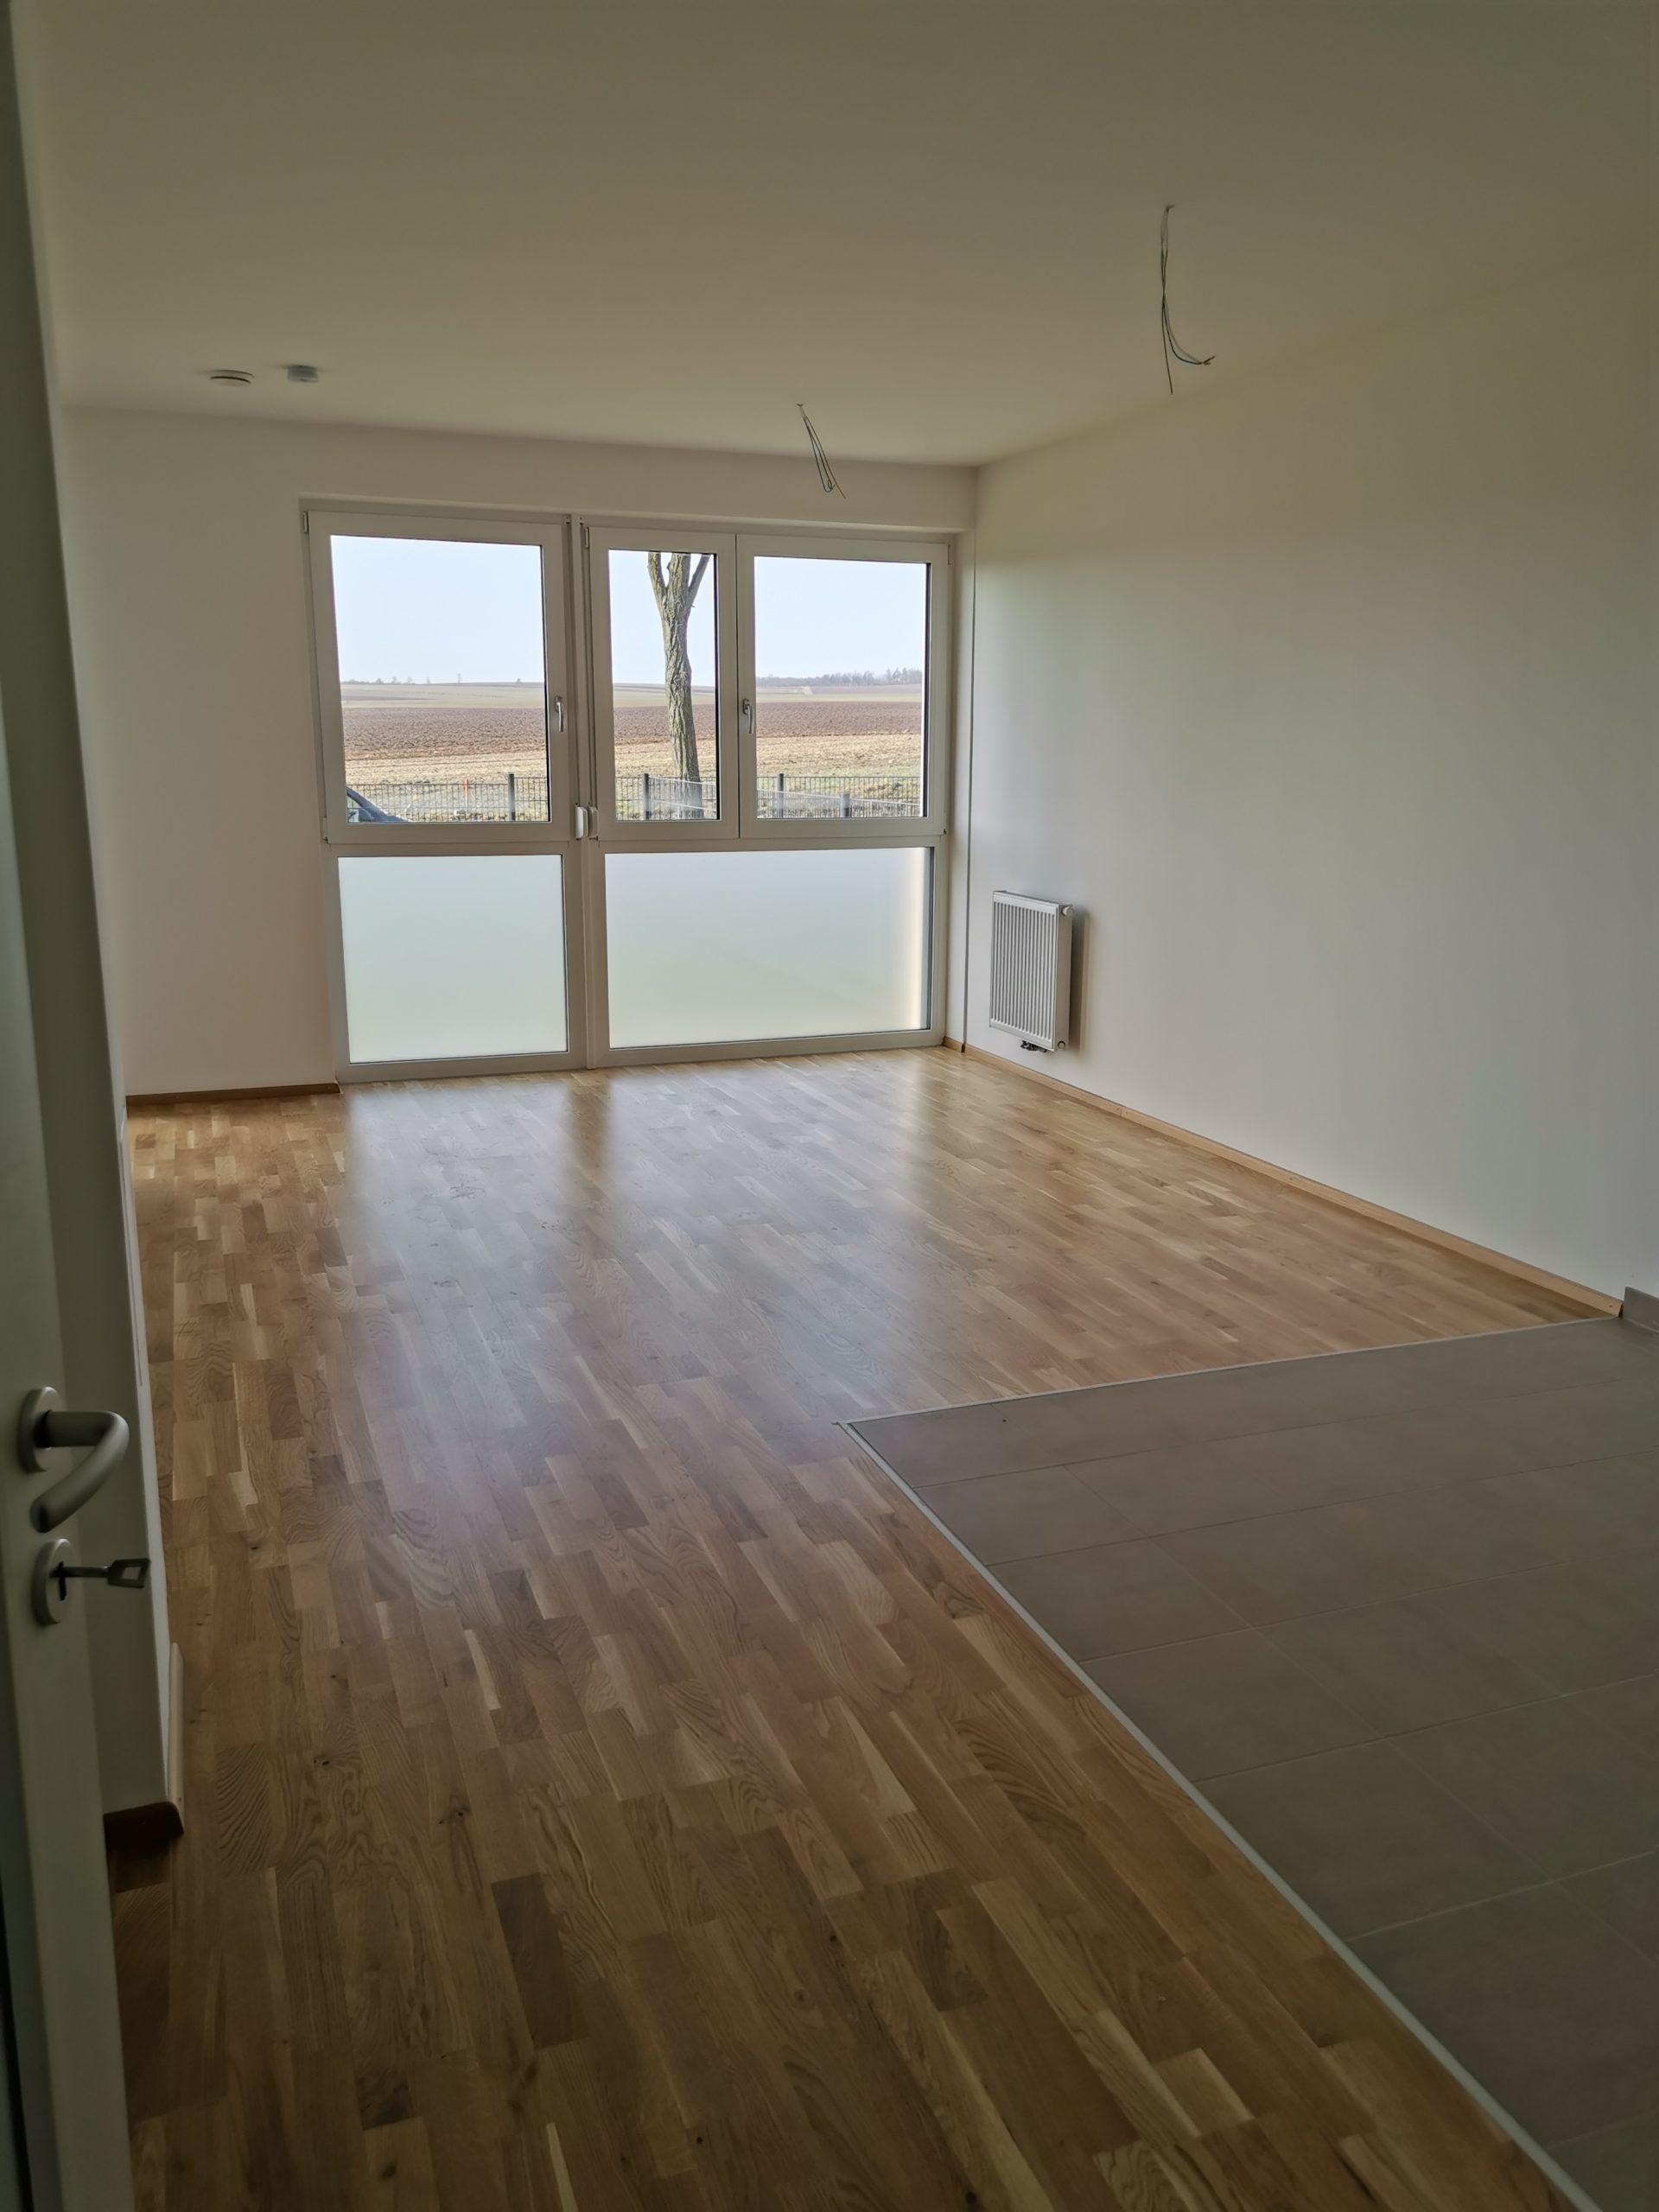 Immobilie von Kamptal in 3730 Eggenburg, Horn, Eggenburg VII - Top 203 #0